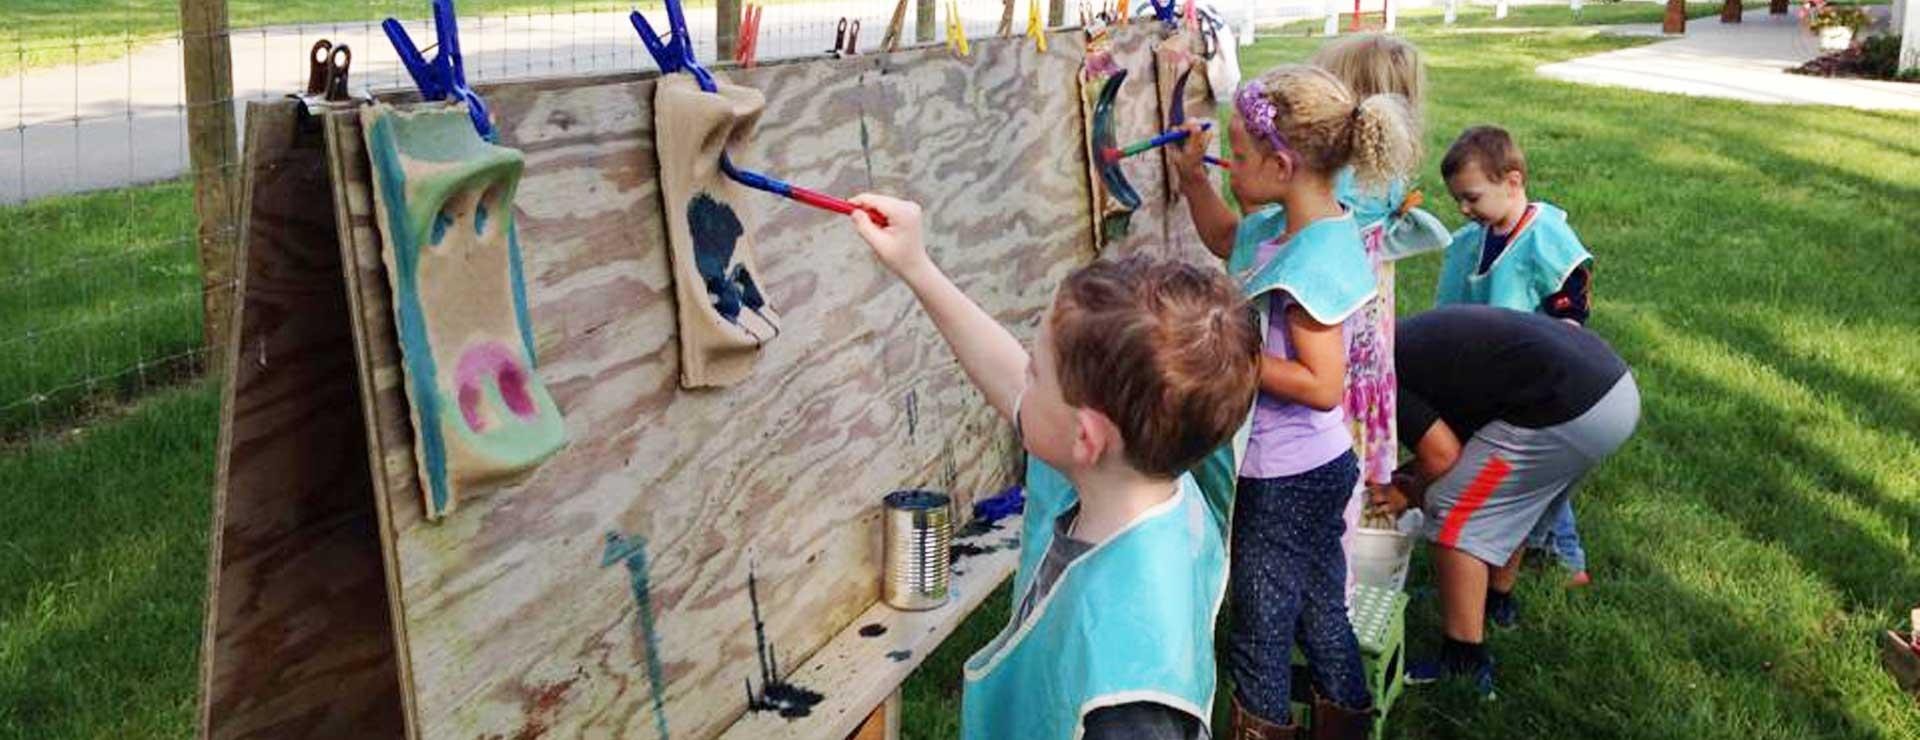 canterbury-creek-farm-preschool-grand-rapids-mi-art-children-painting